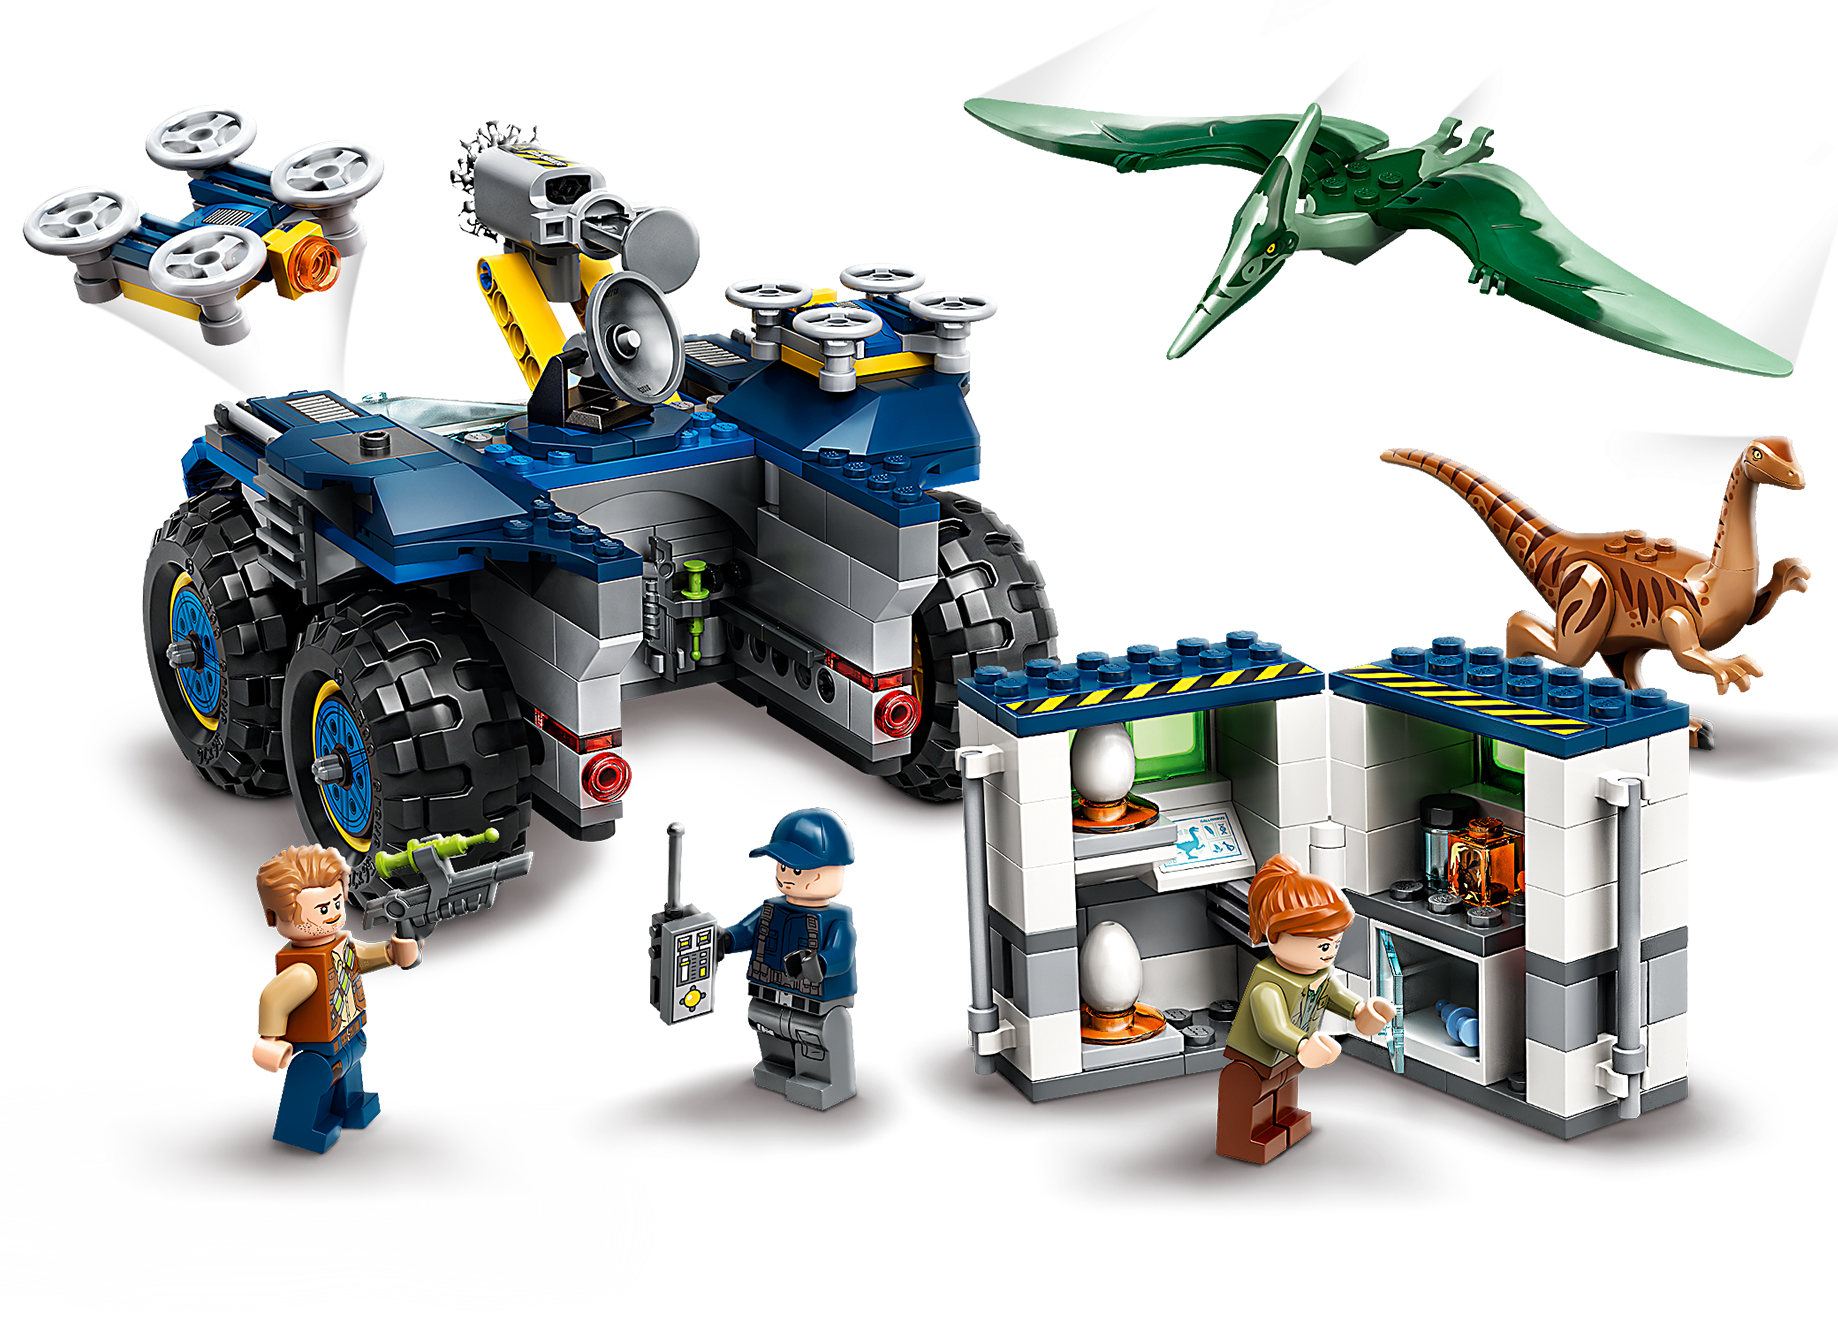 LEGO NEW Jurassic World Pteranodon flying dinosaur 75940